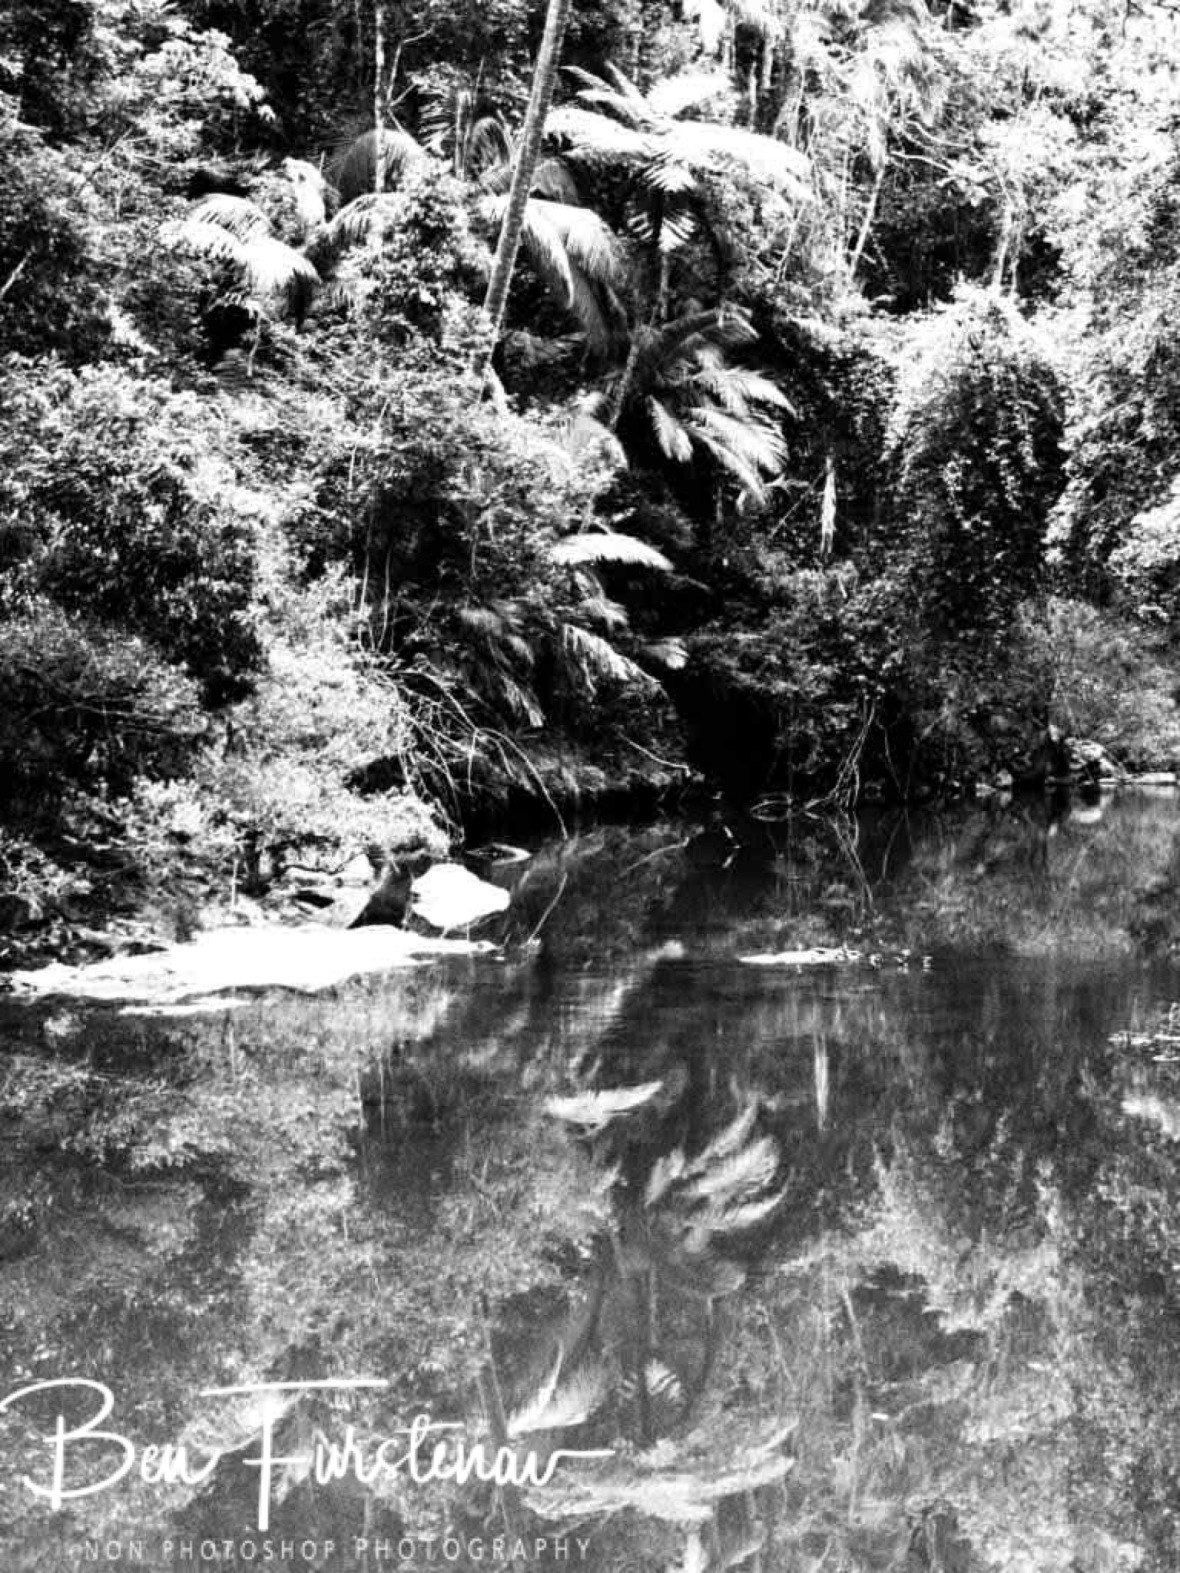 Monochrome reflections at Eungalla National Parks, Queensland, Australia